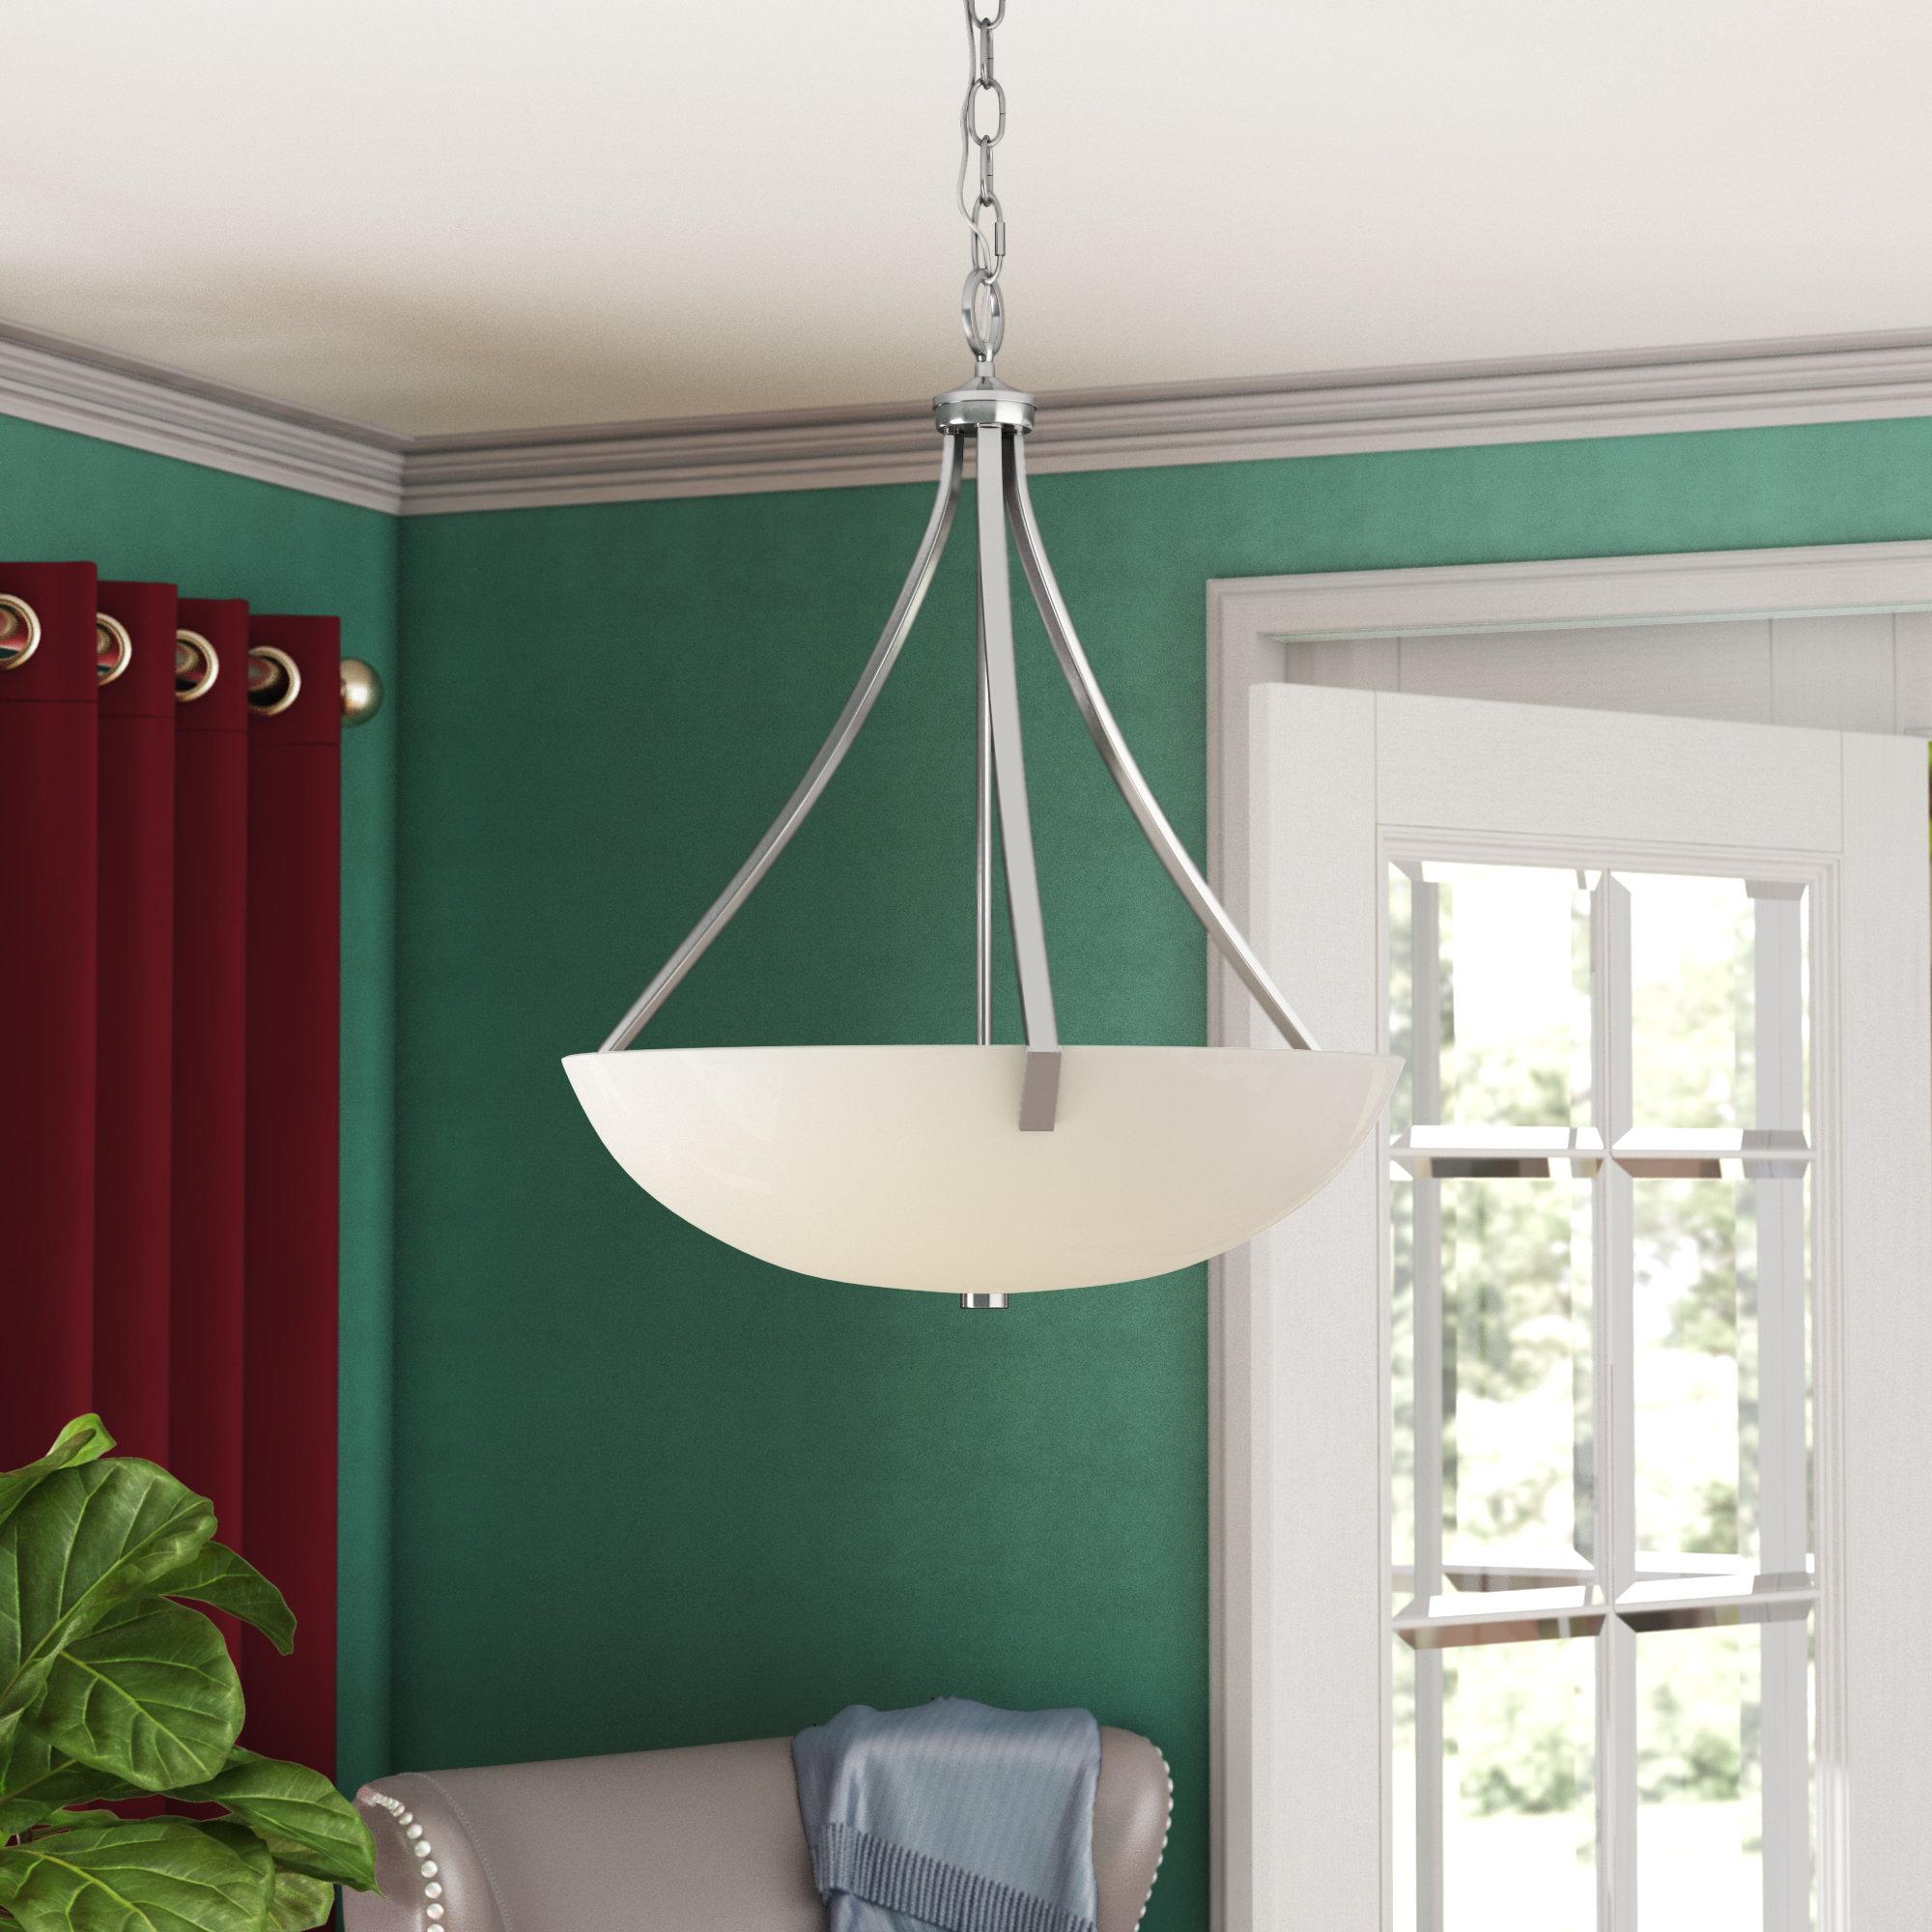 Newent 3 Light Single Bowl Pendants With Current Vandorn 3 Light Bowl Pendant (Gallery 11 of 20)